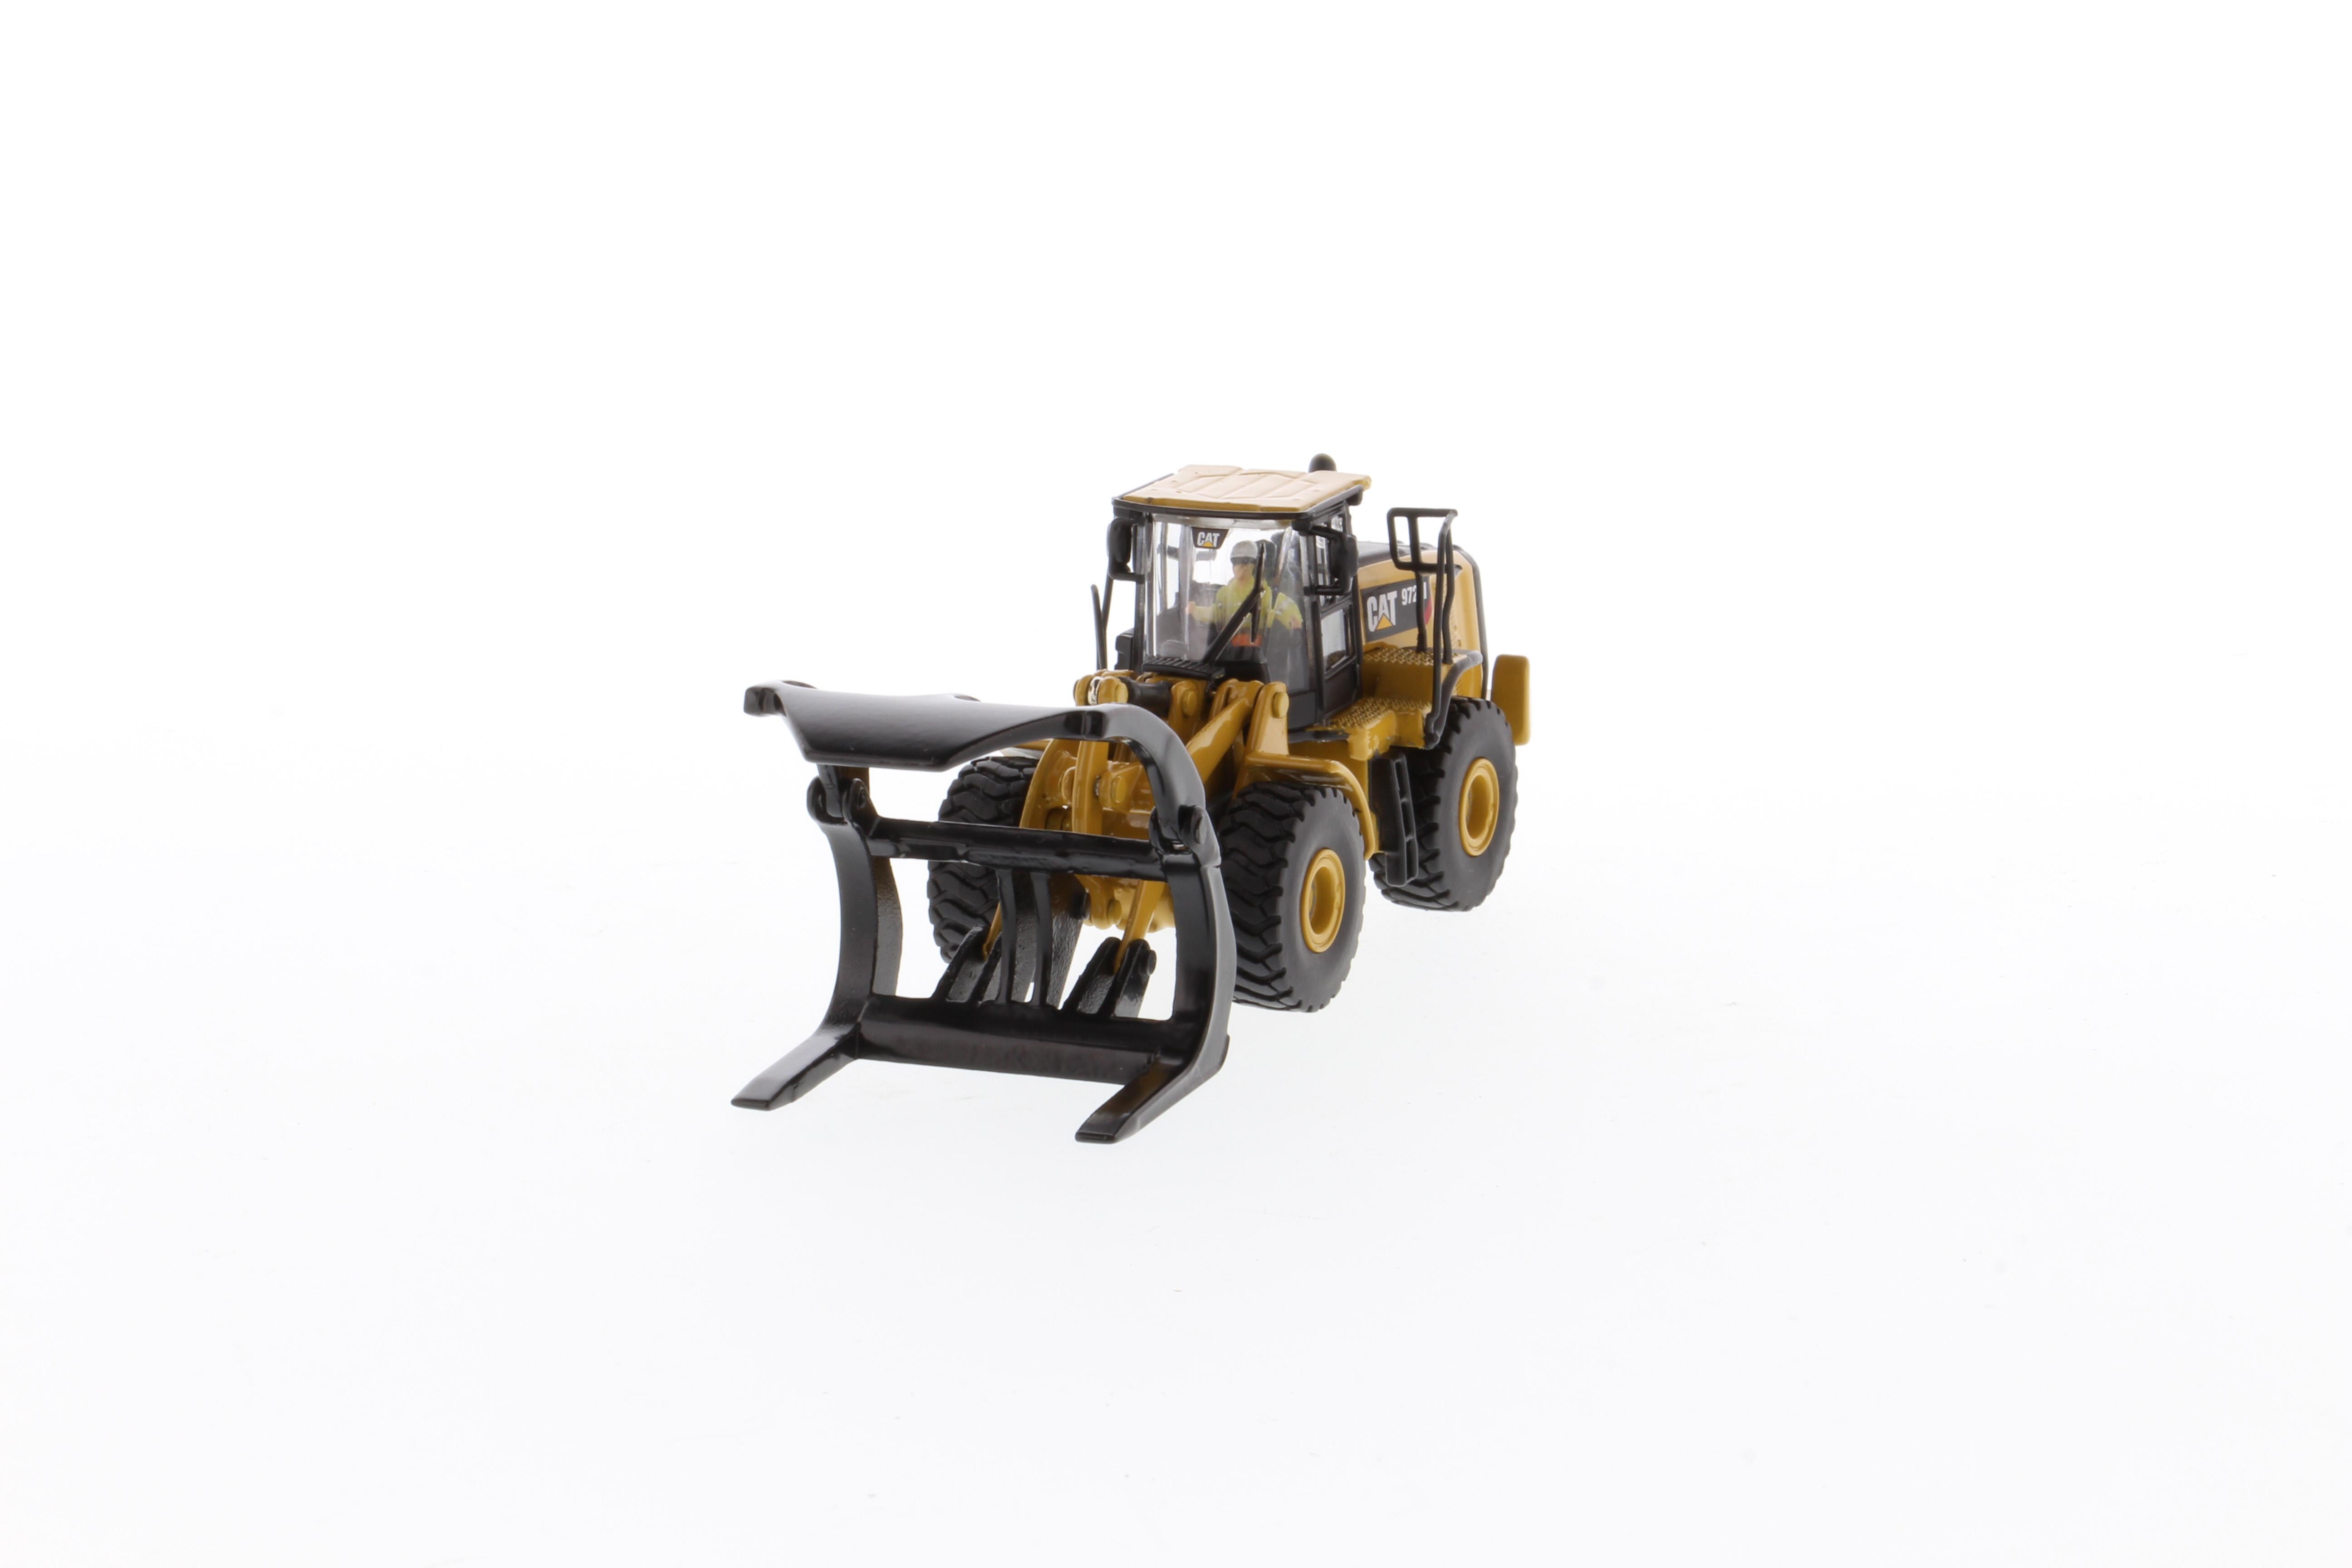 Cat 972m Wheel Loader With Log Forks 85950 1 87 Scale